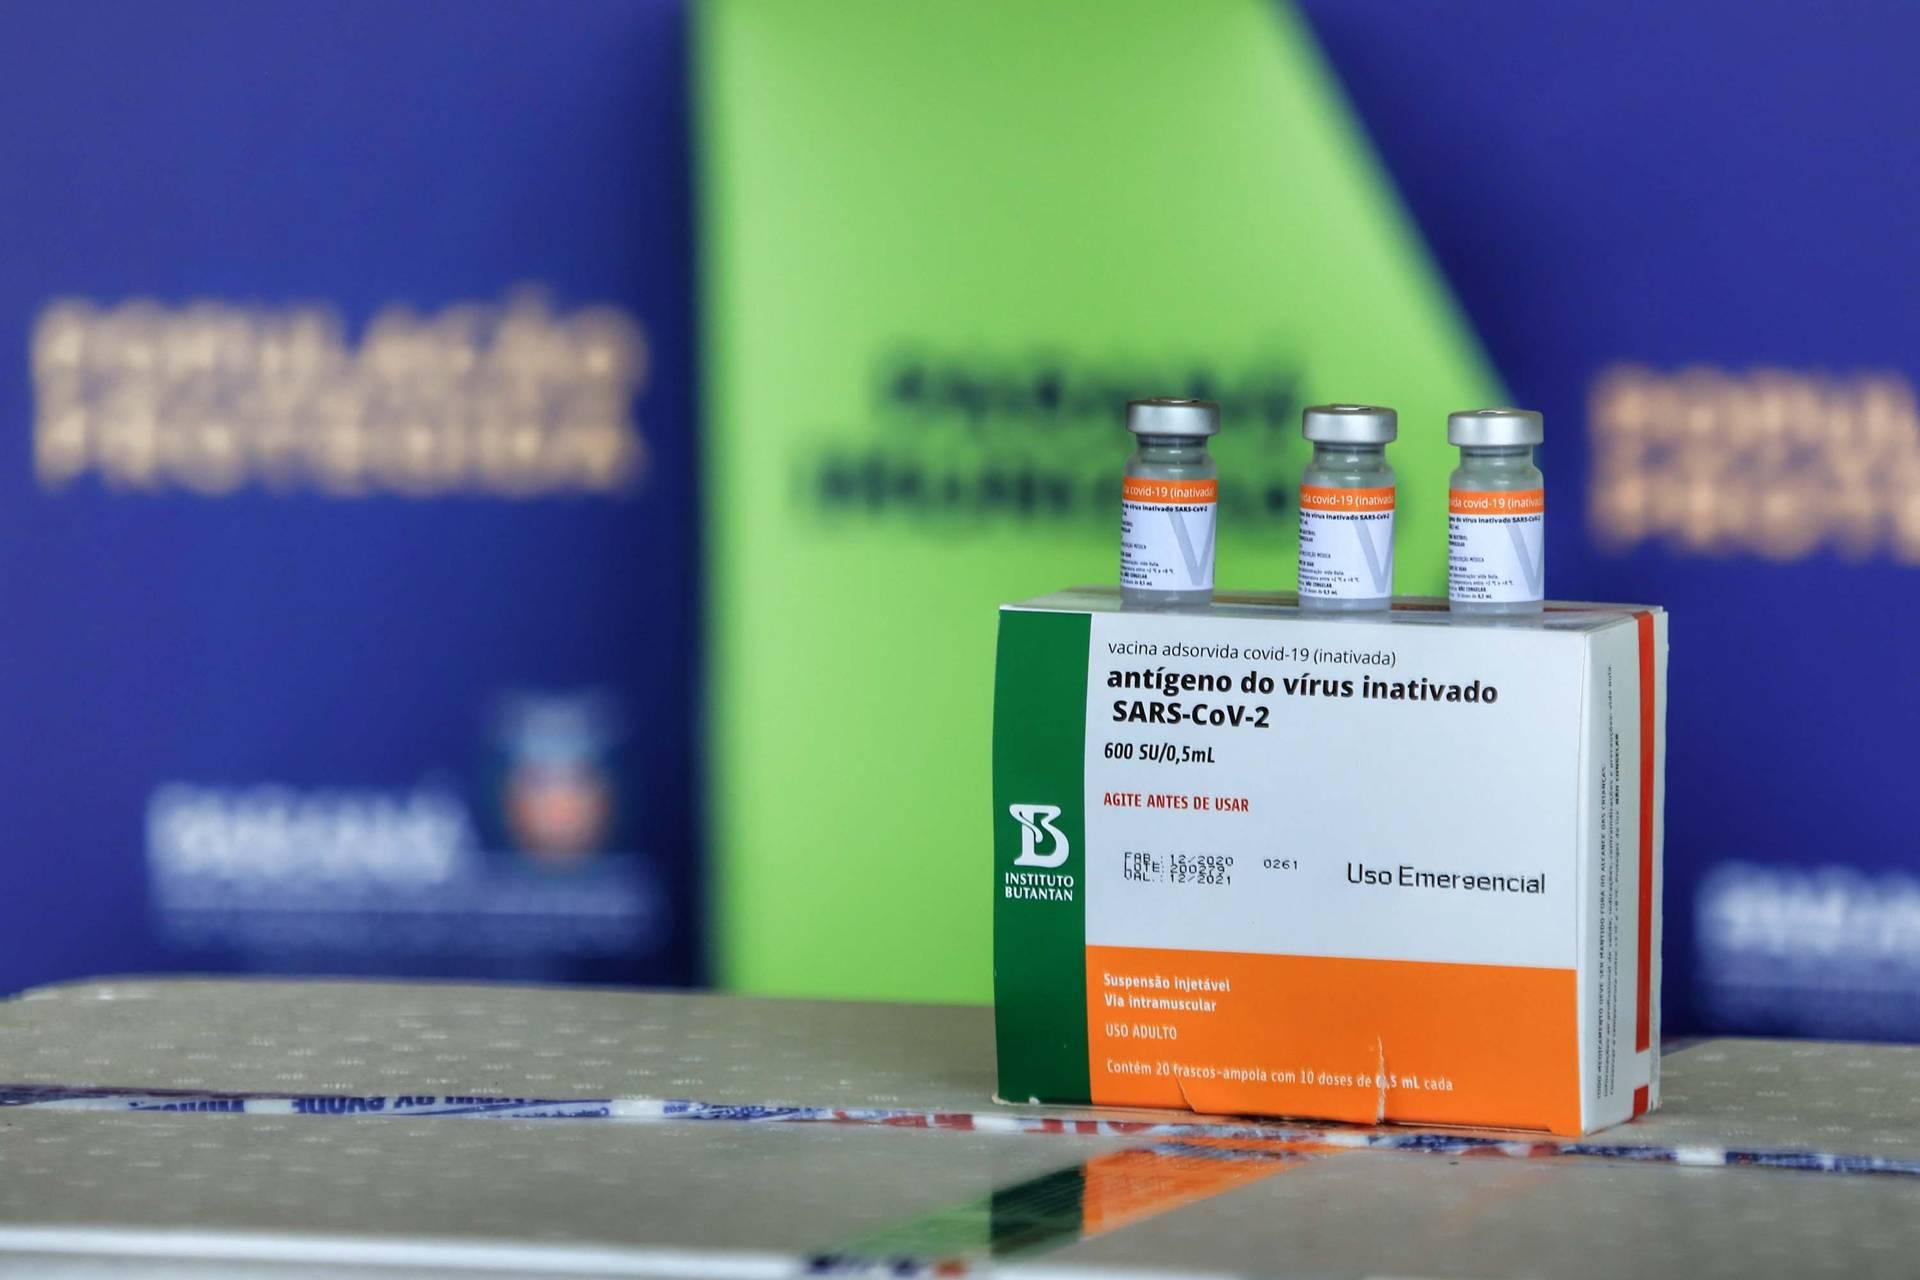 Paraná recebe 14.600 doses da Coronavac/Butantan